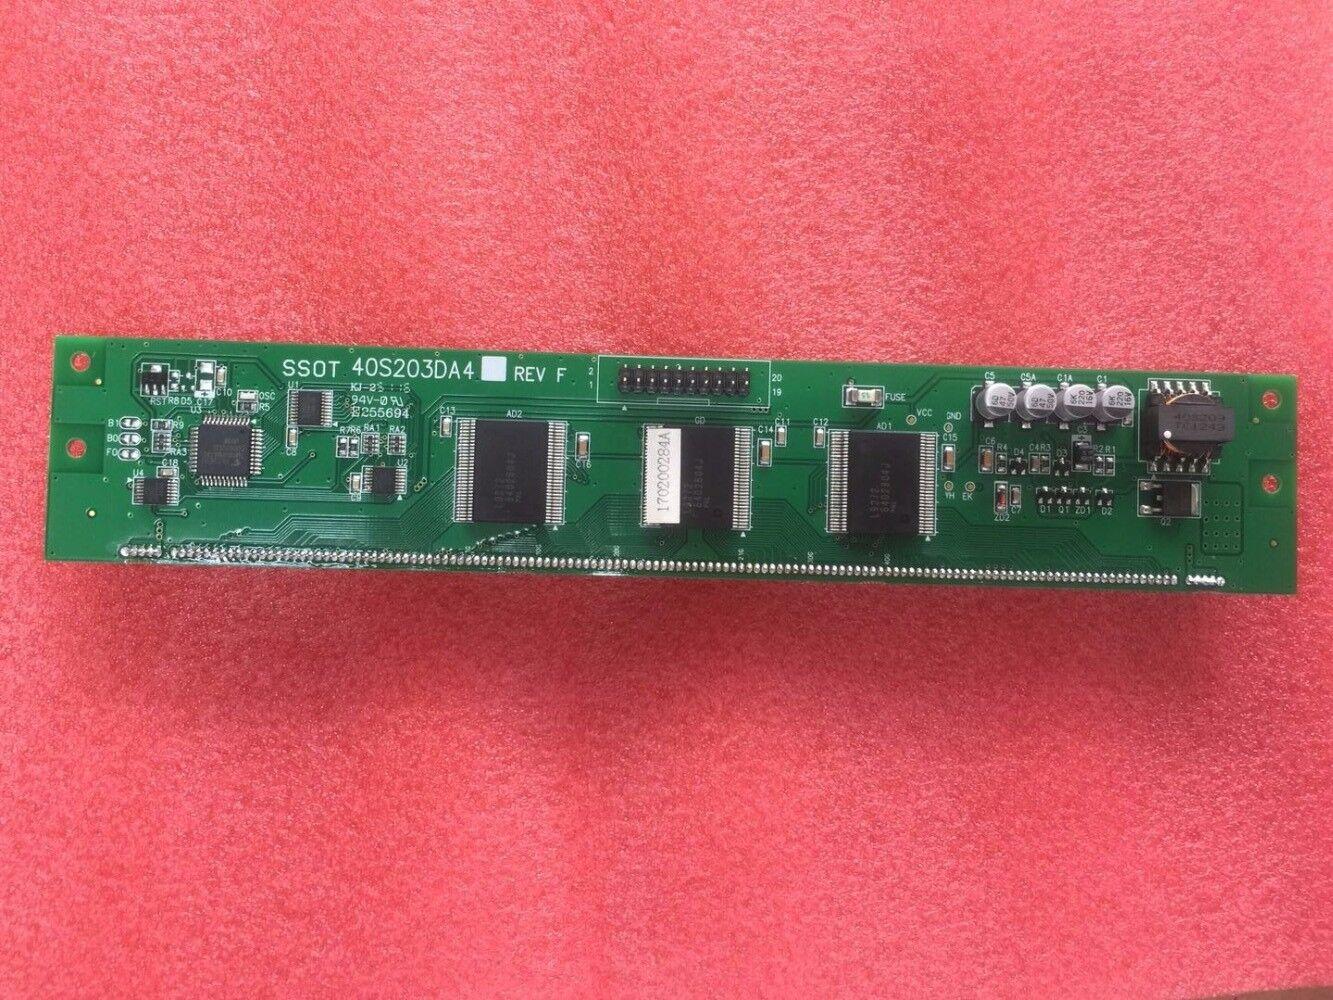 New And Original Vacuum Fluorescent Display Module 40S203DA4 Repair replacement